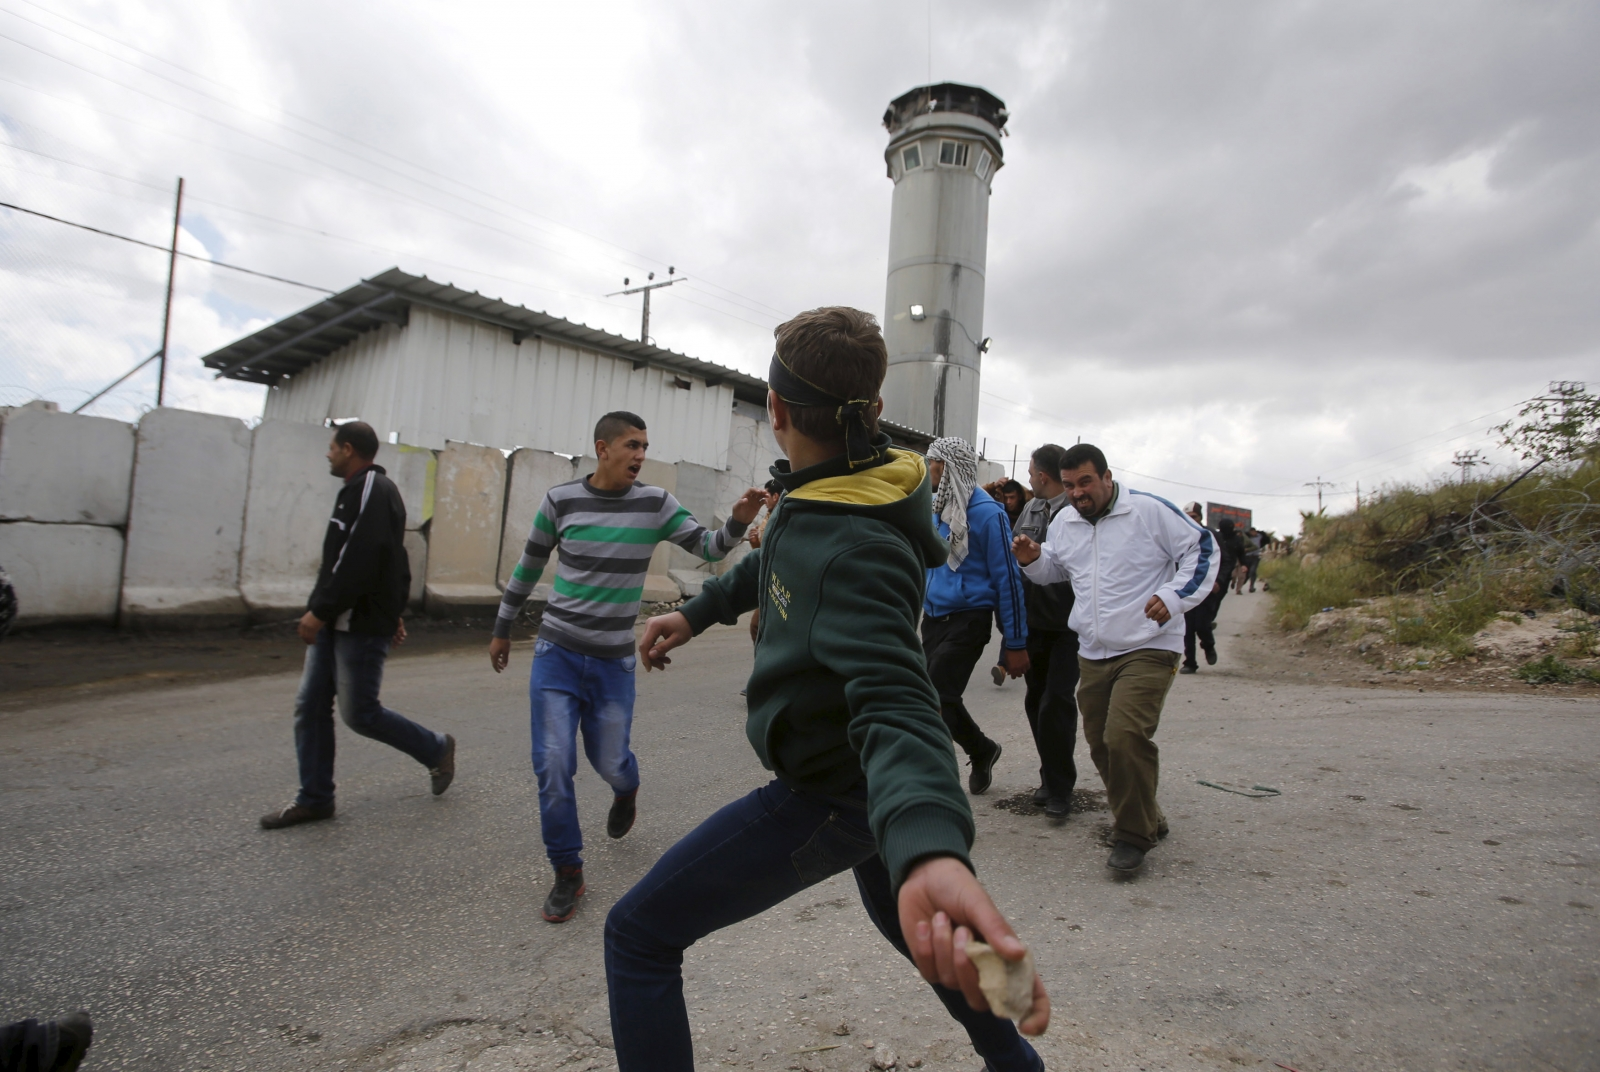 Palestinian stone thrower